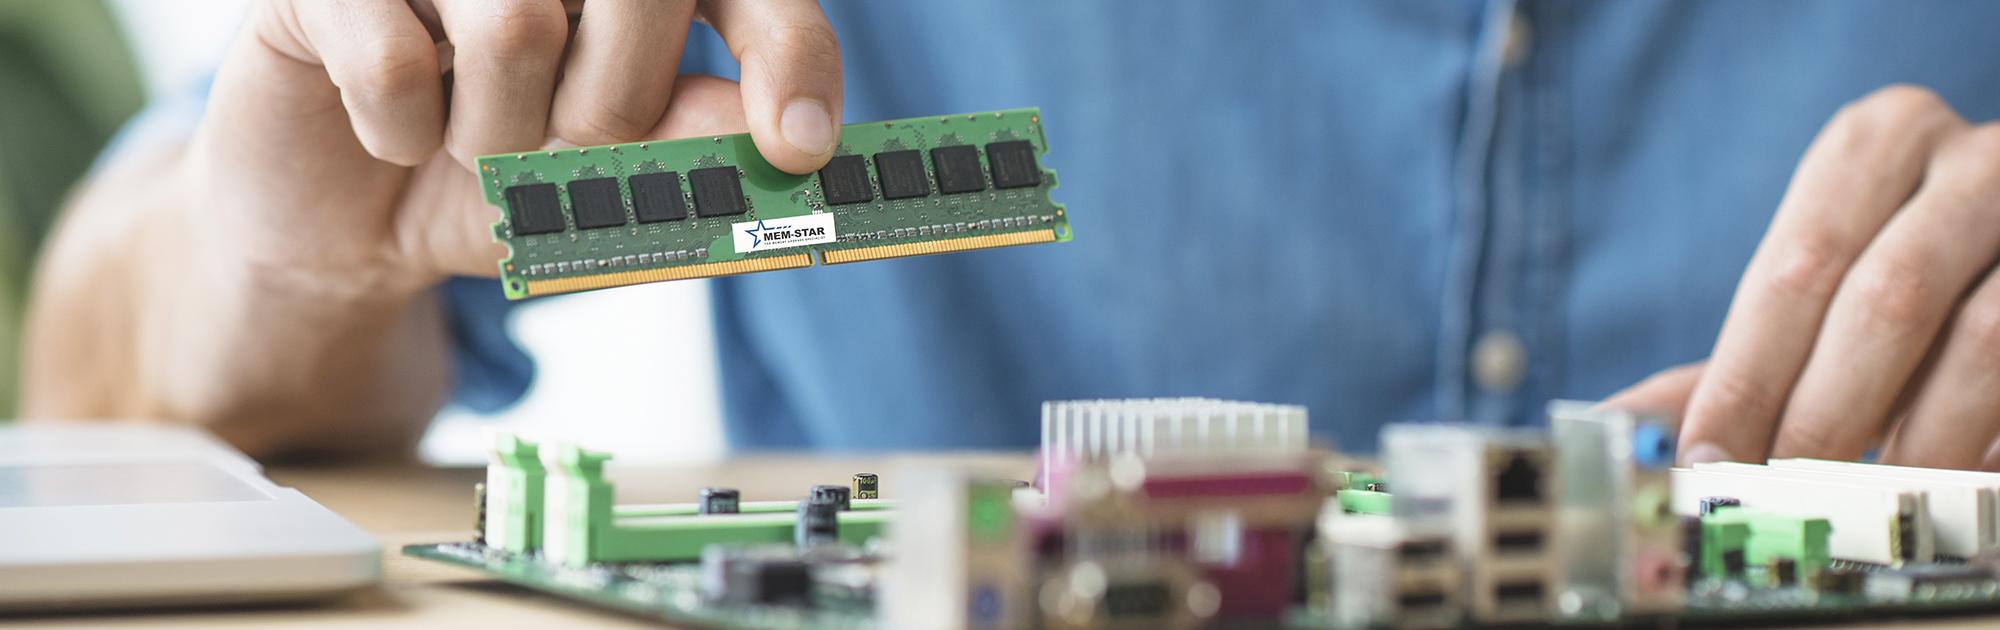 Mem-Star Desktop Memory Upgrade